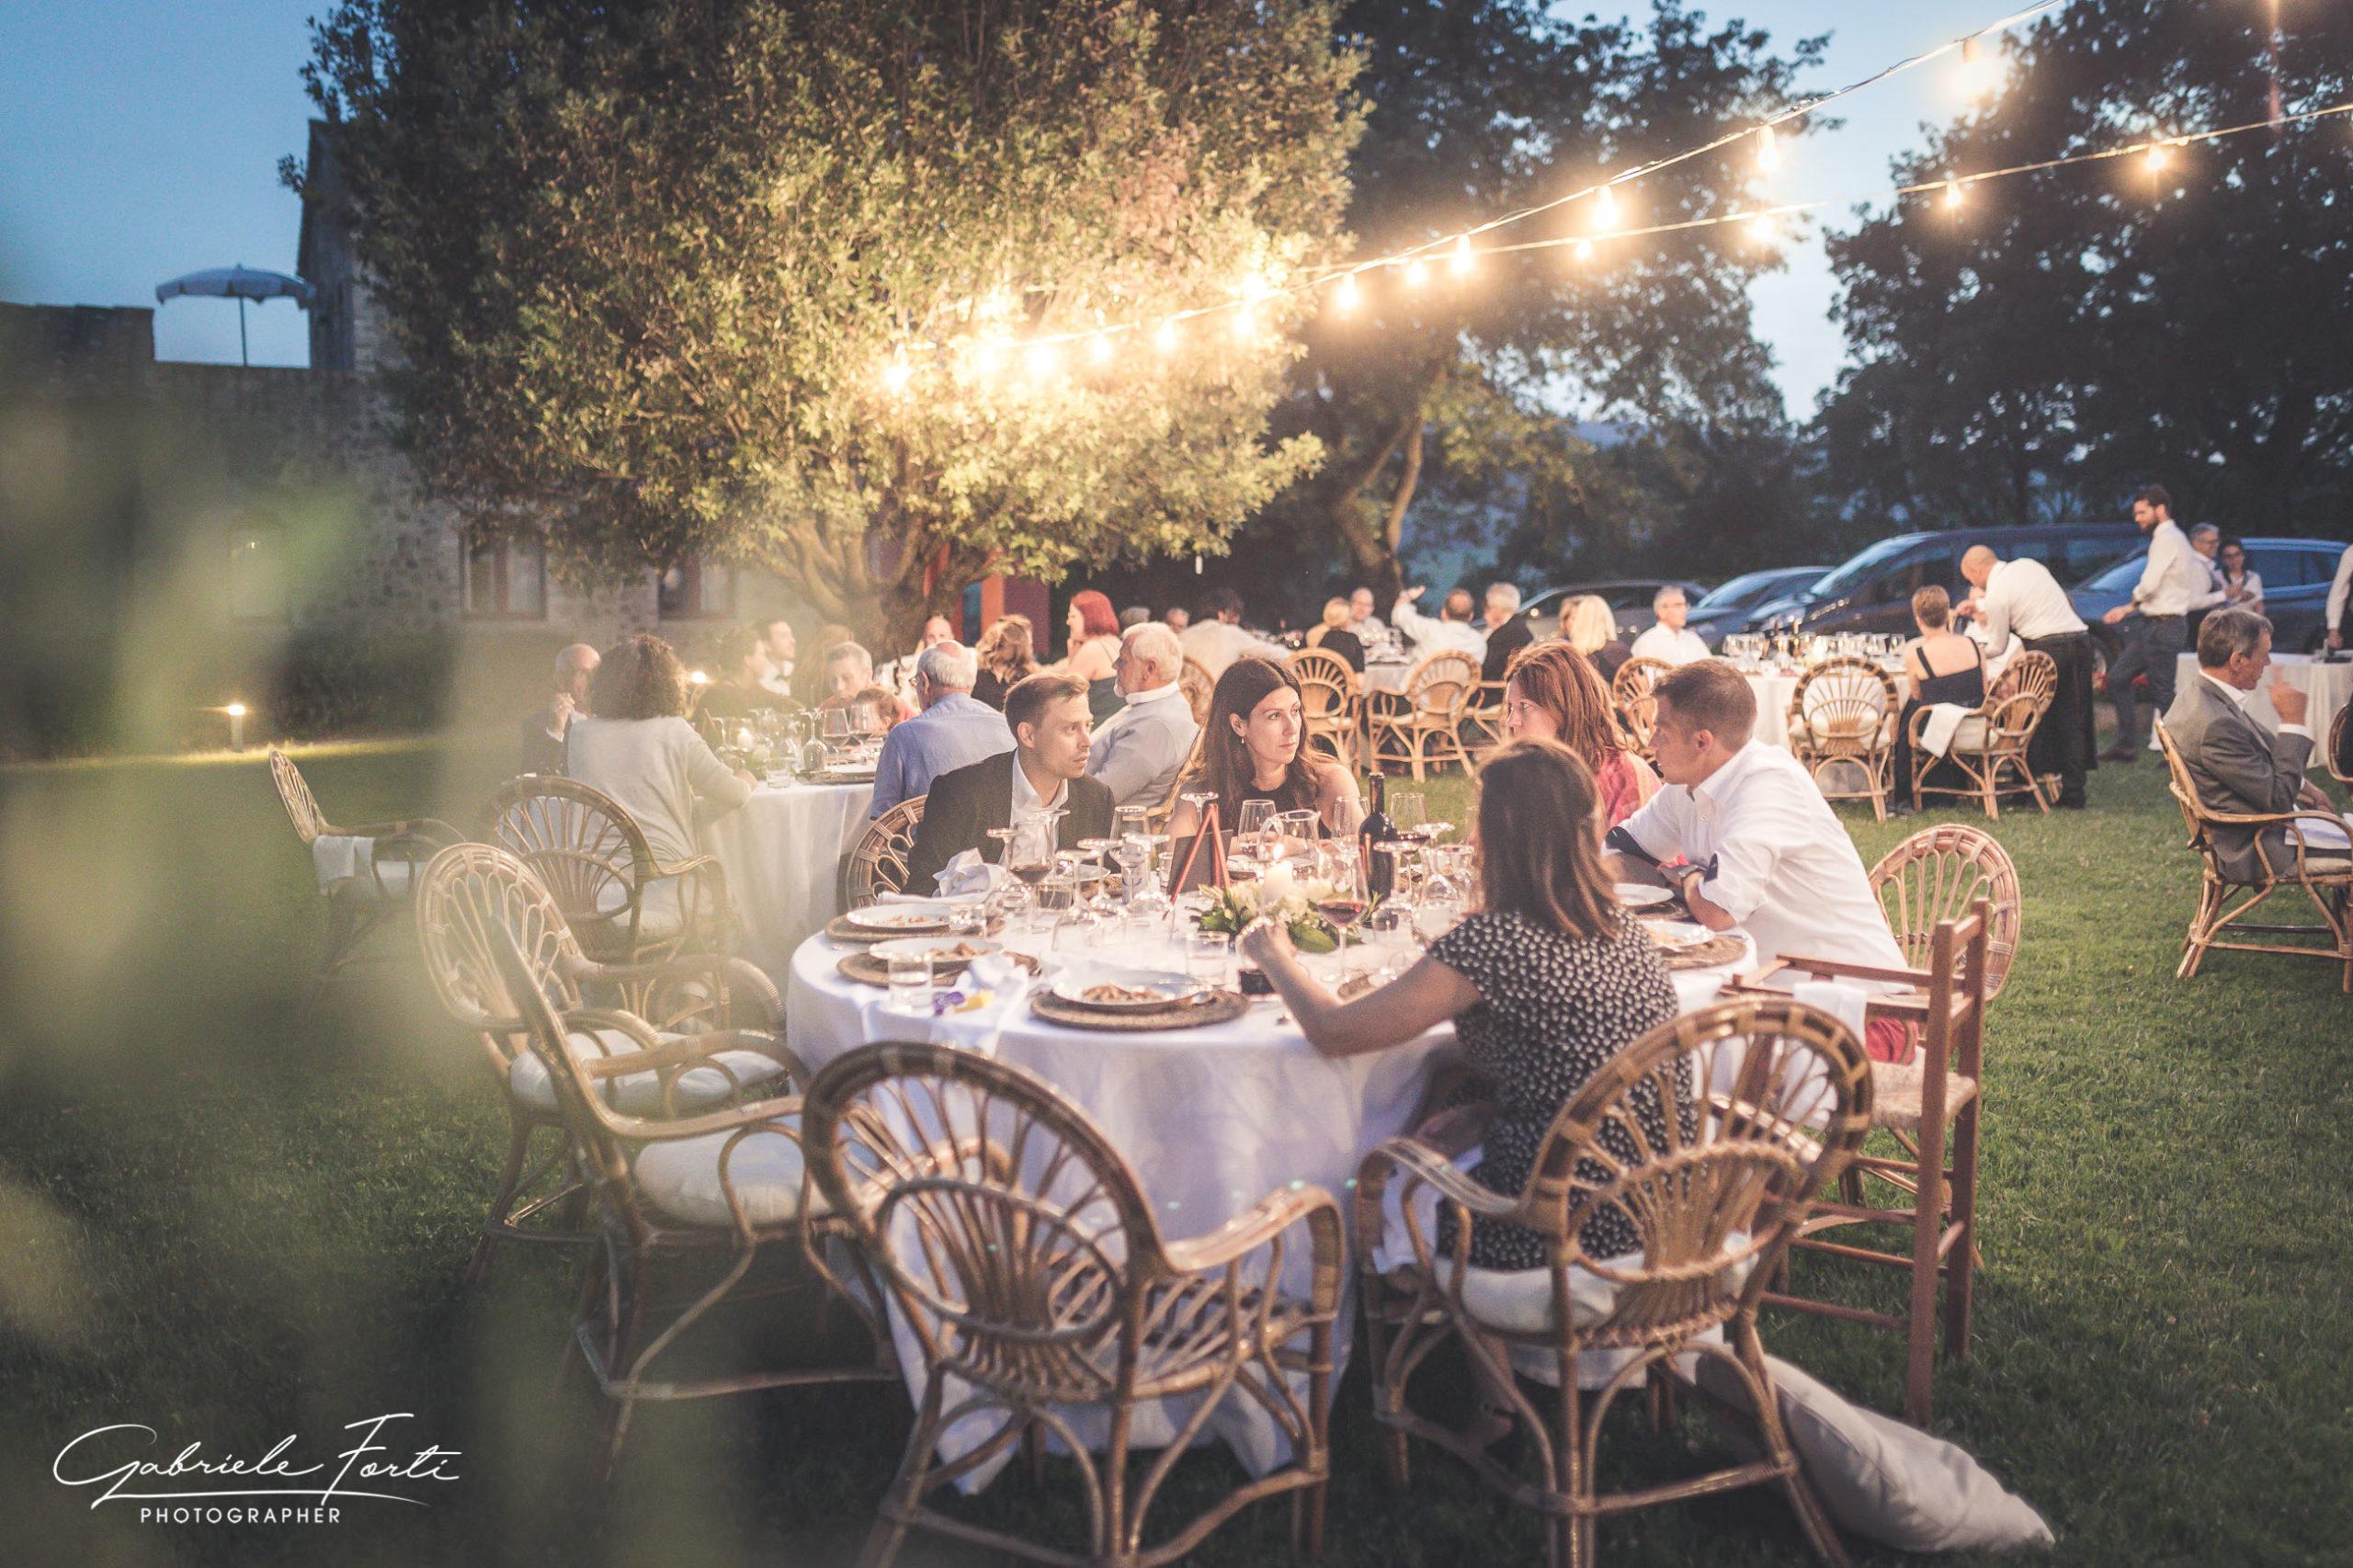 castello-banfi-wedding-piani-rossi-photo-shooting-italy-foto-forti-wedding-3